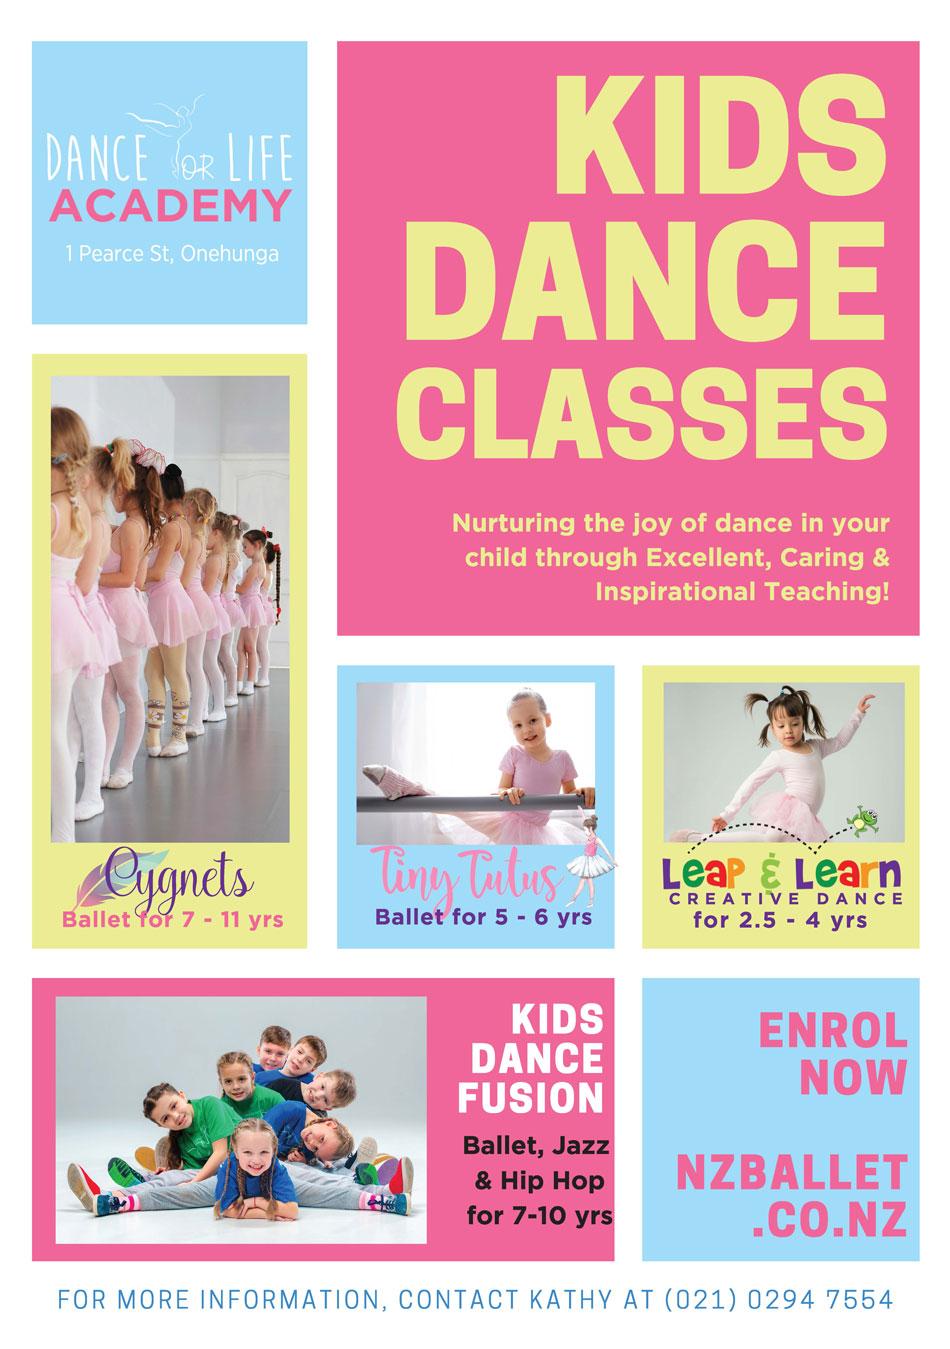 Dance for Life Academy